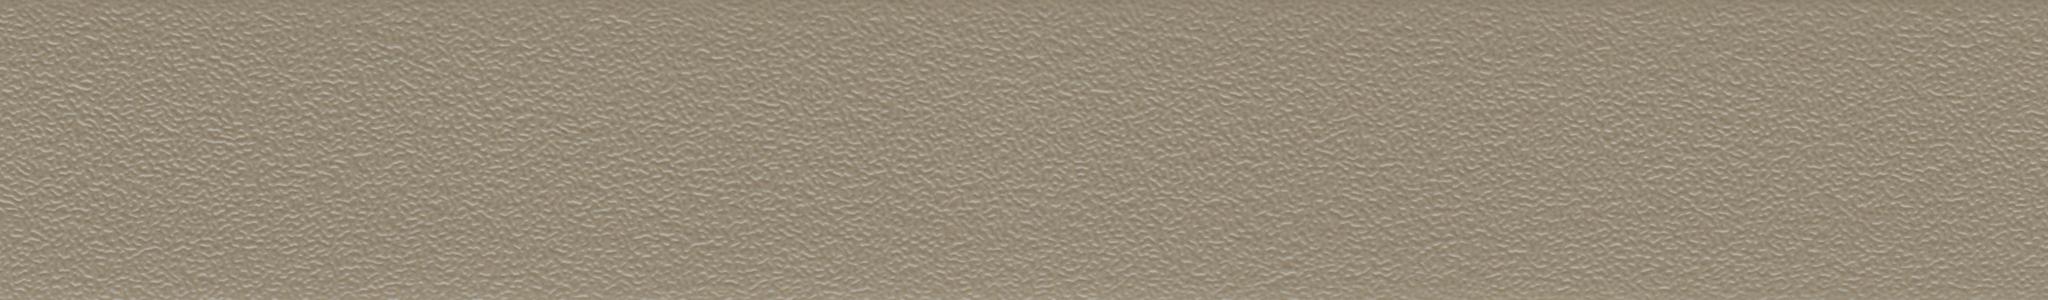 HU 182512 ABS hrana hnědá perla 101